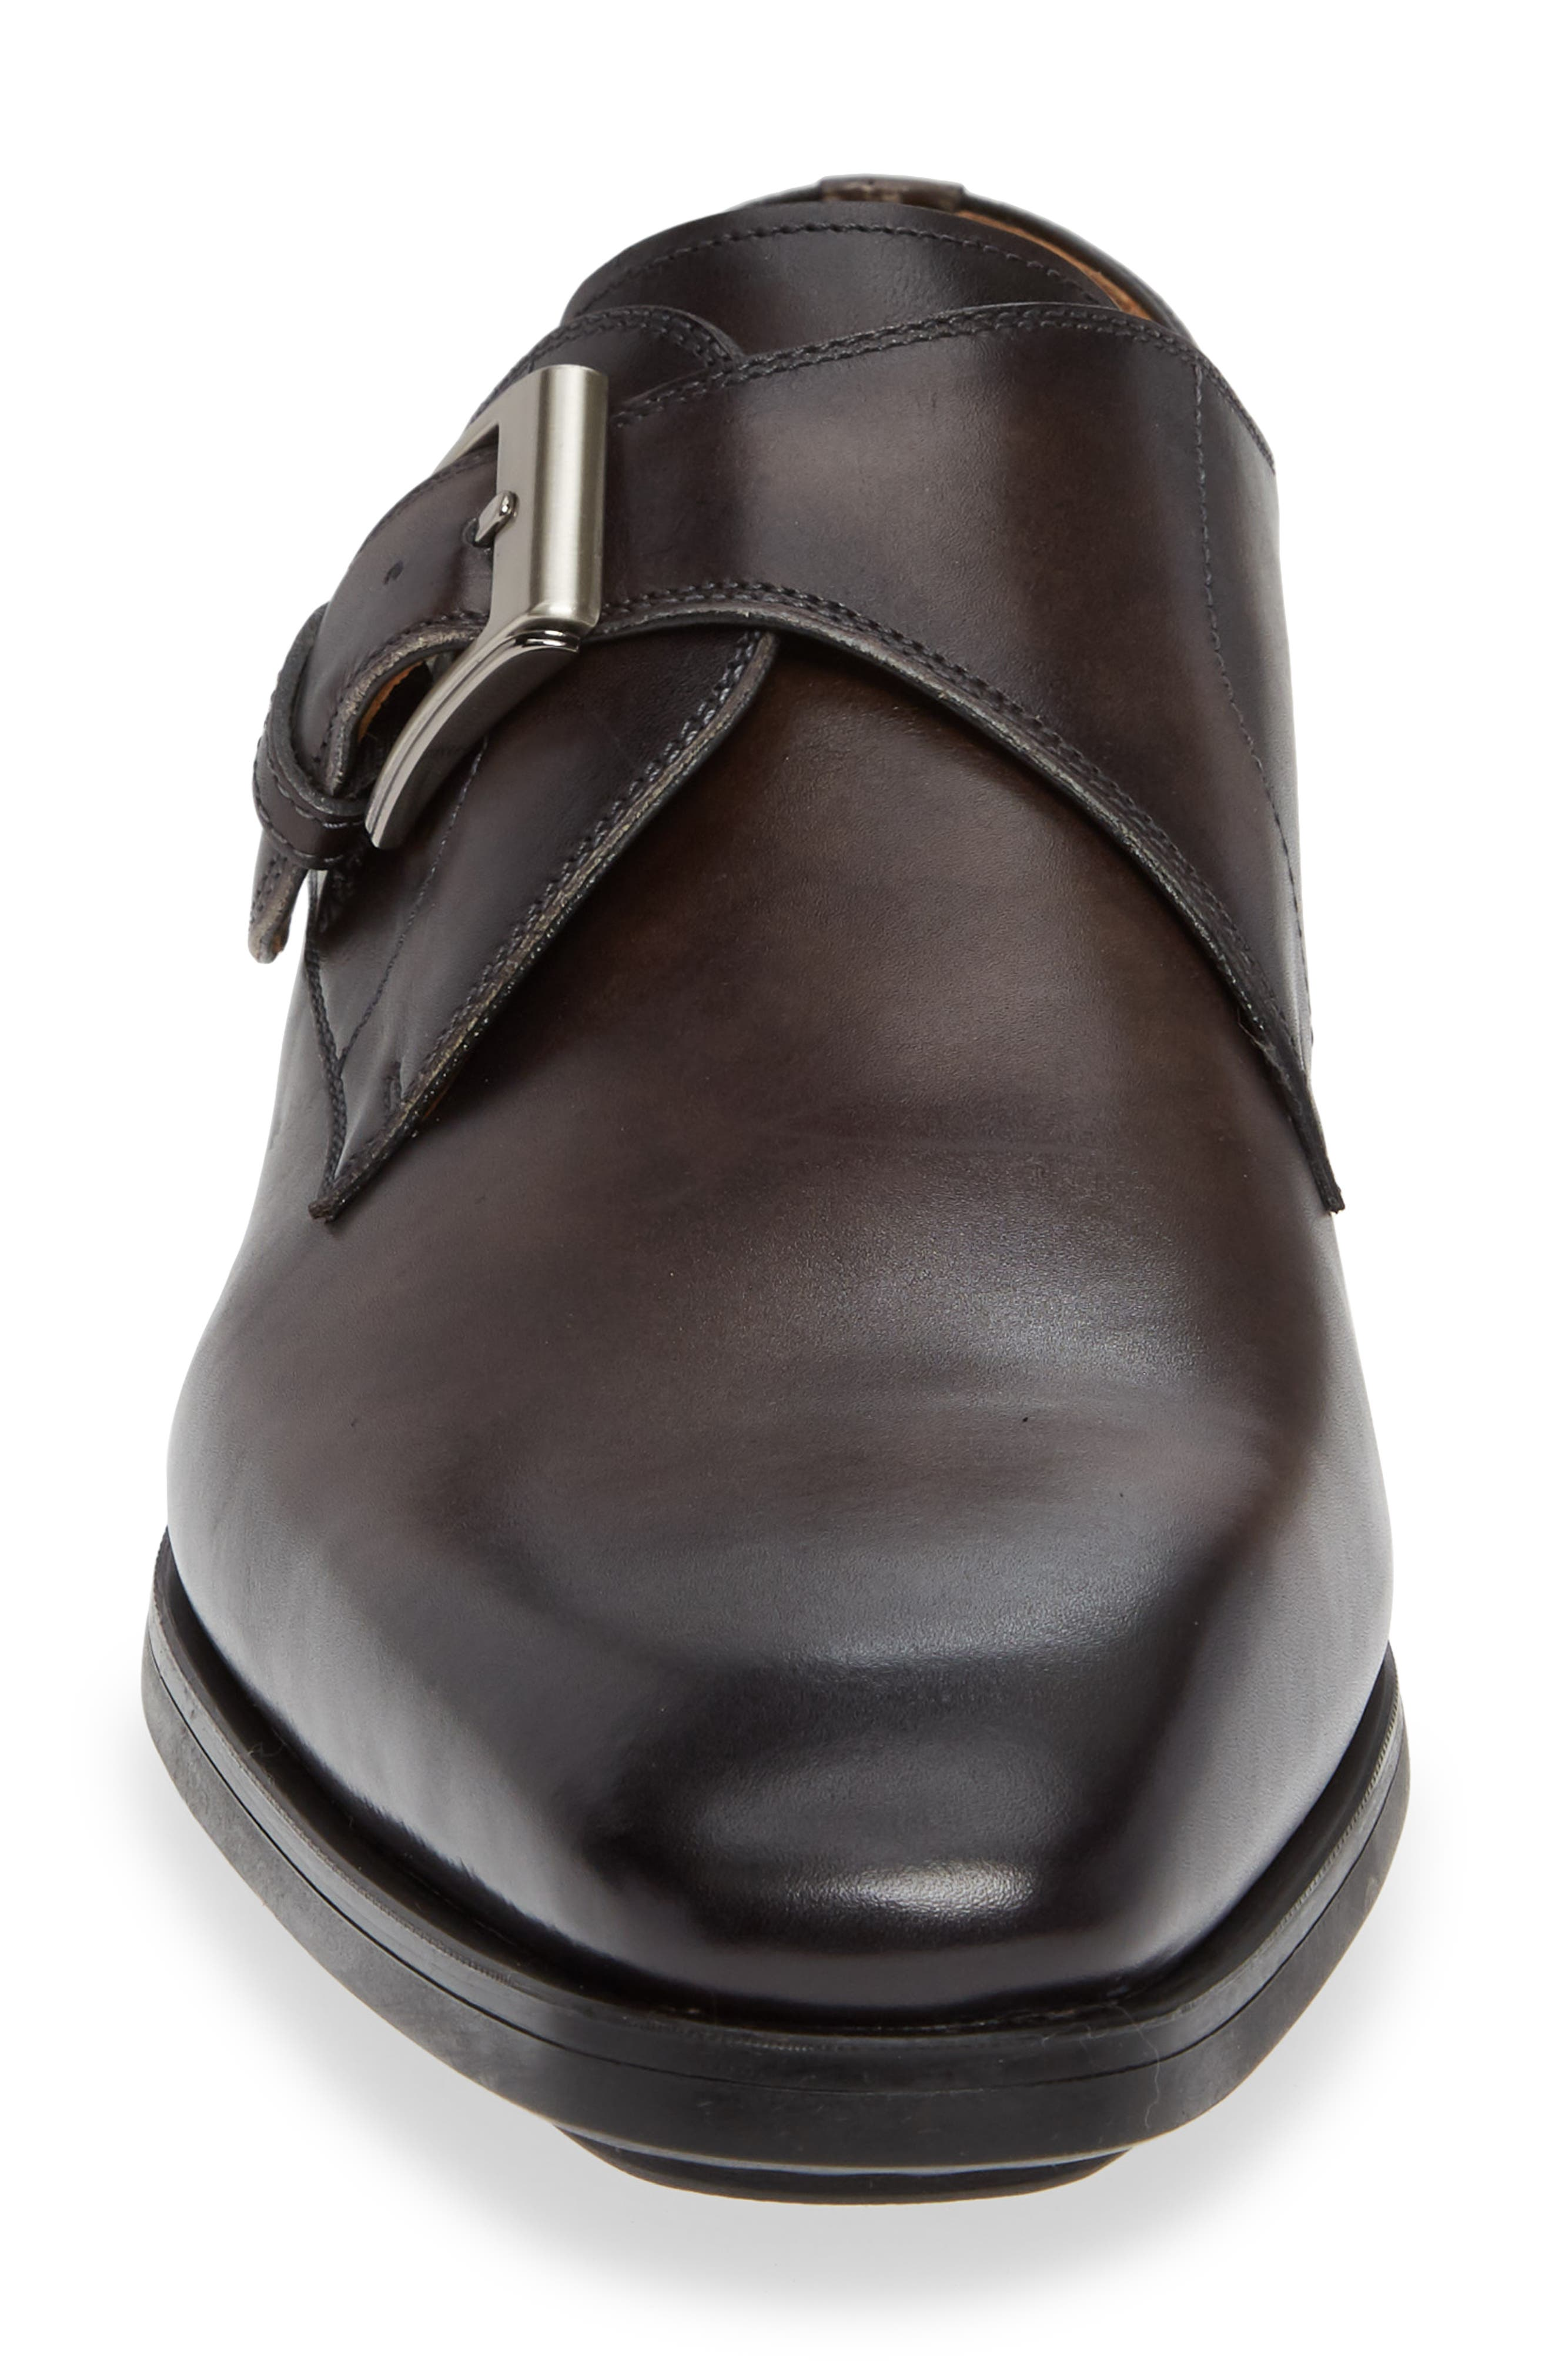 Roddy Monk Strap Shoe,                             Alternate thumbnail 4, color,                             GREY LEATHER